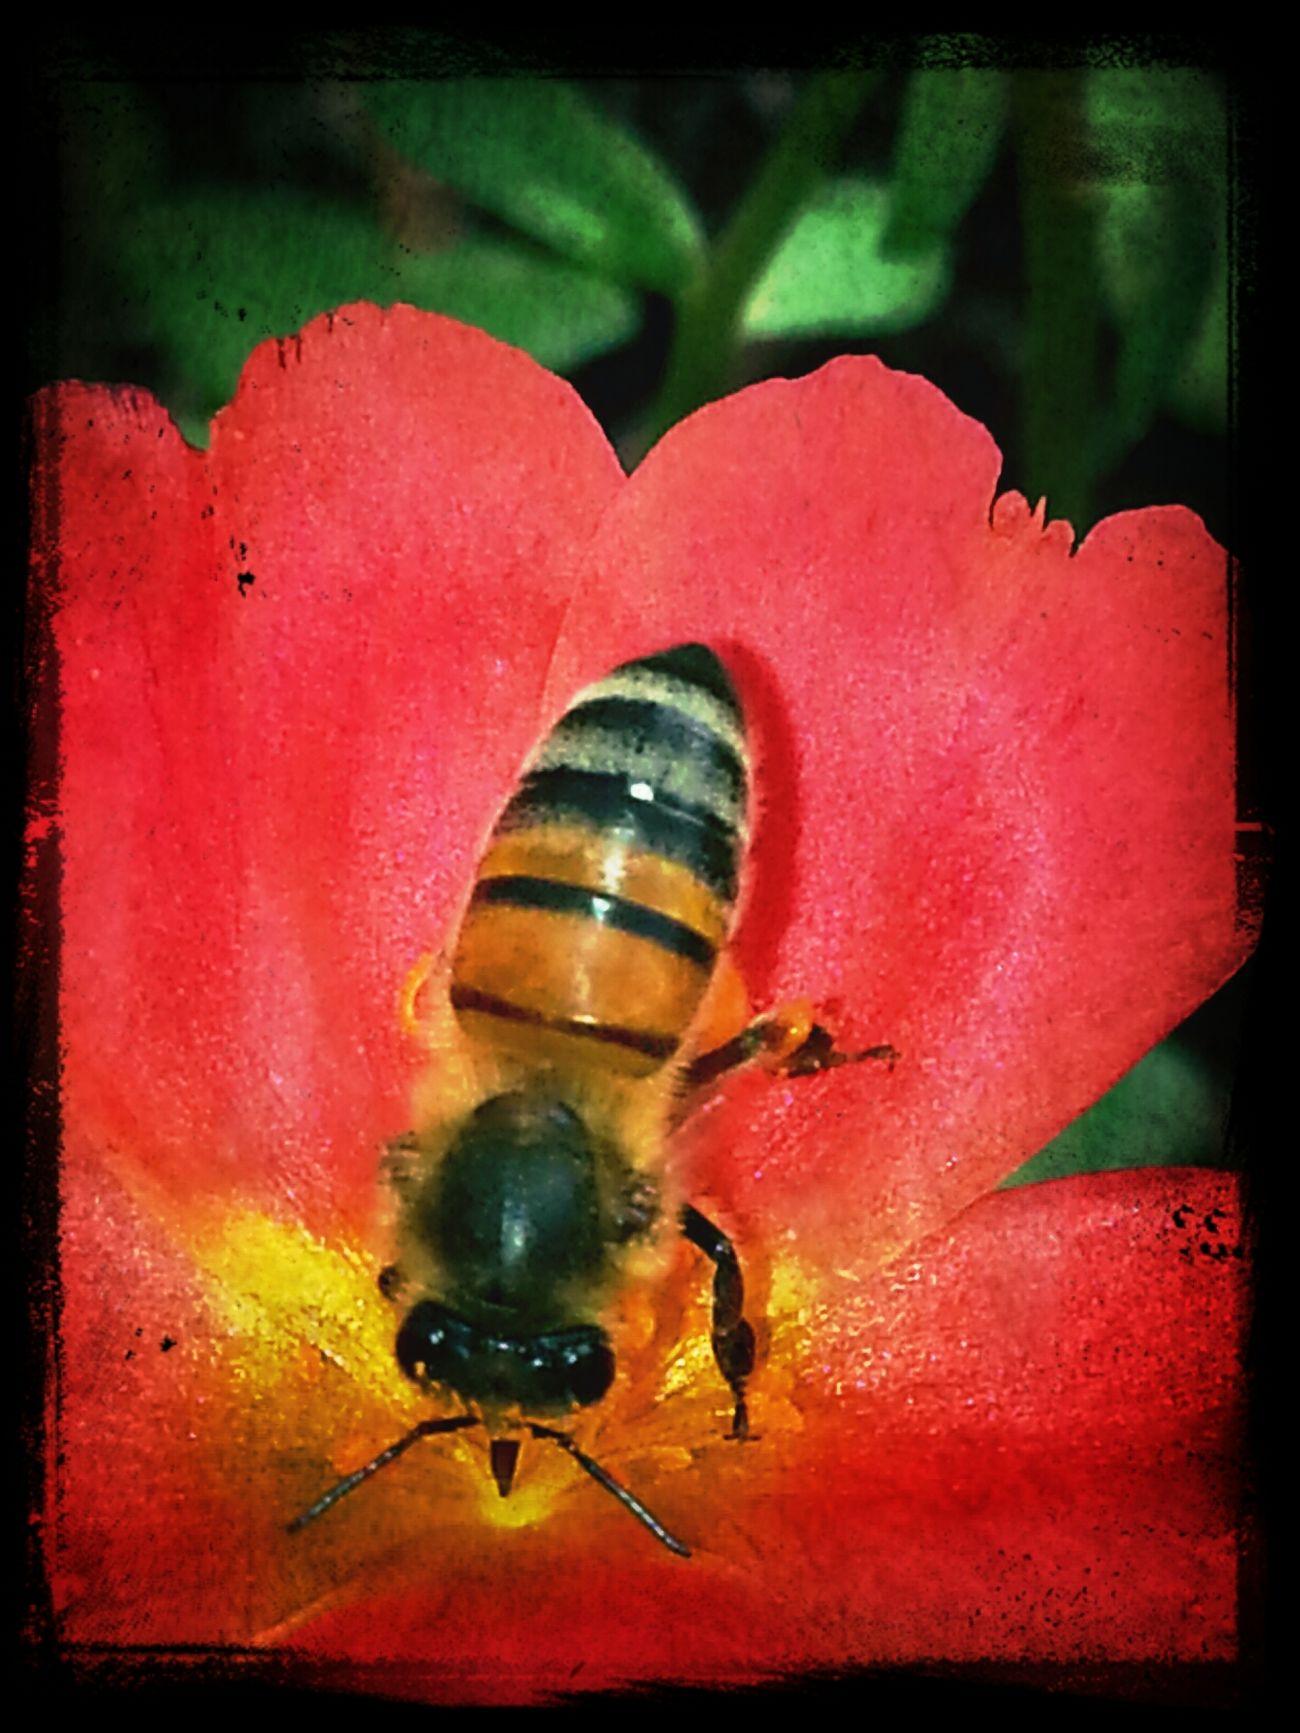 Bee_love Collecting Pollen Macro_bugs EyeEm Bugs